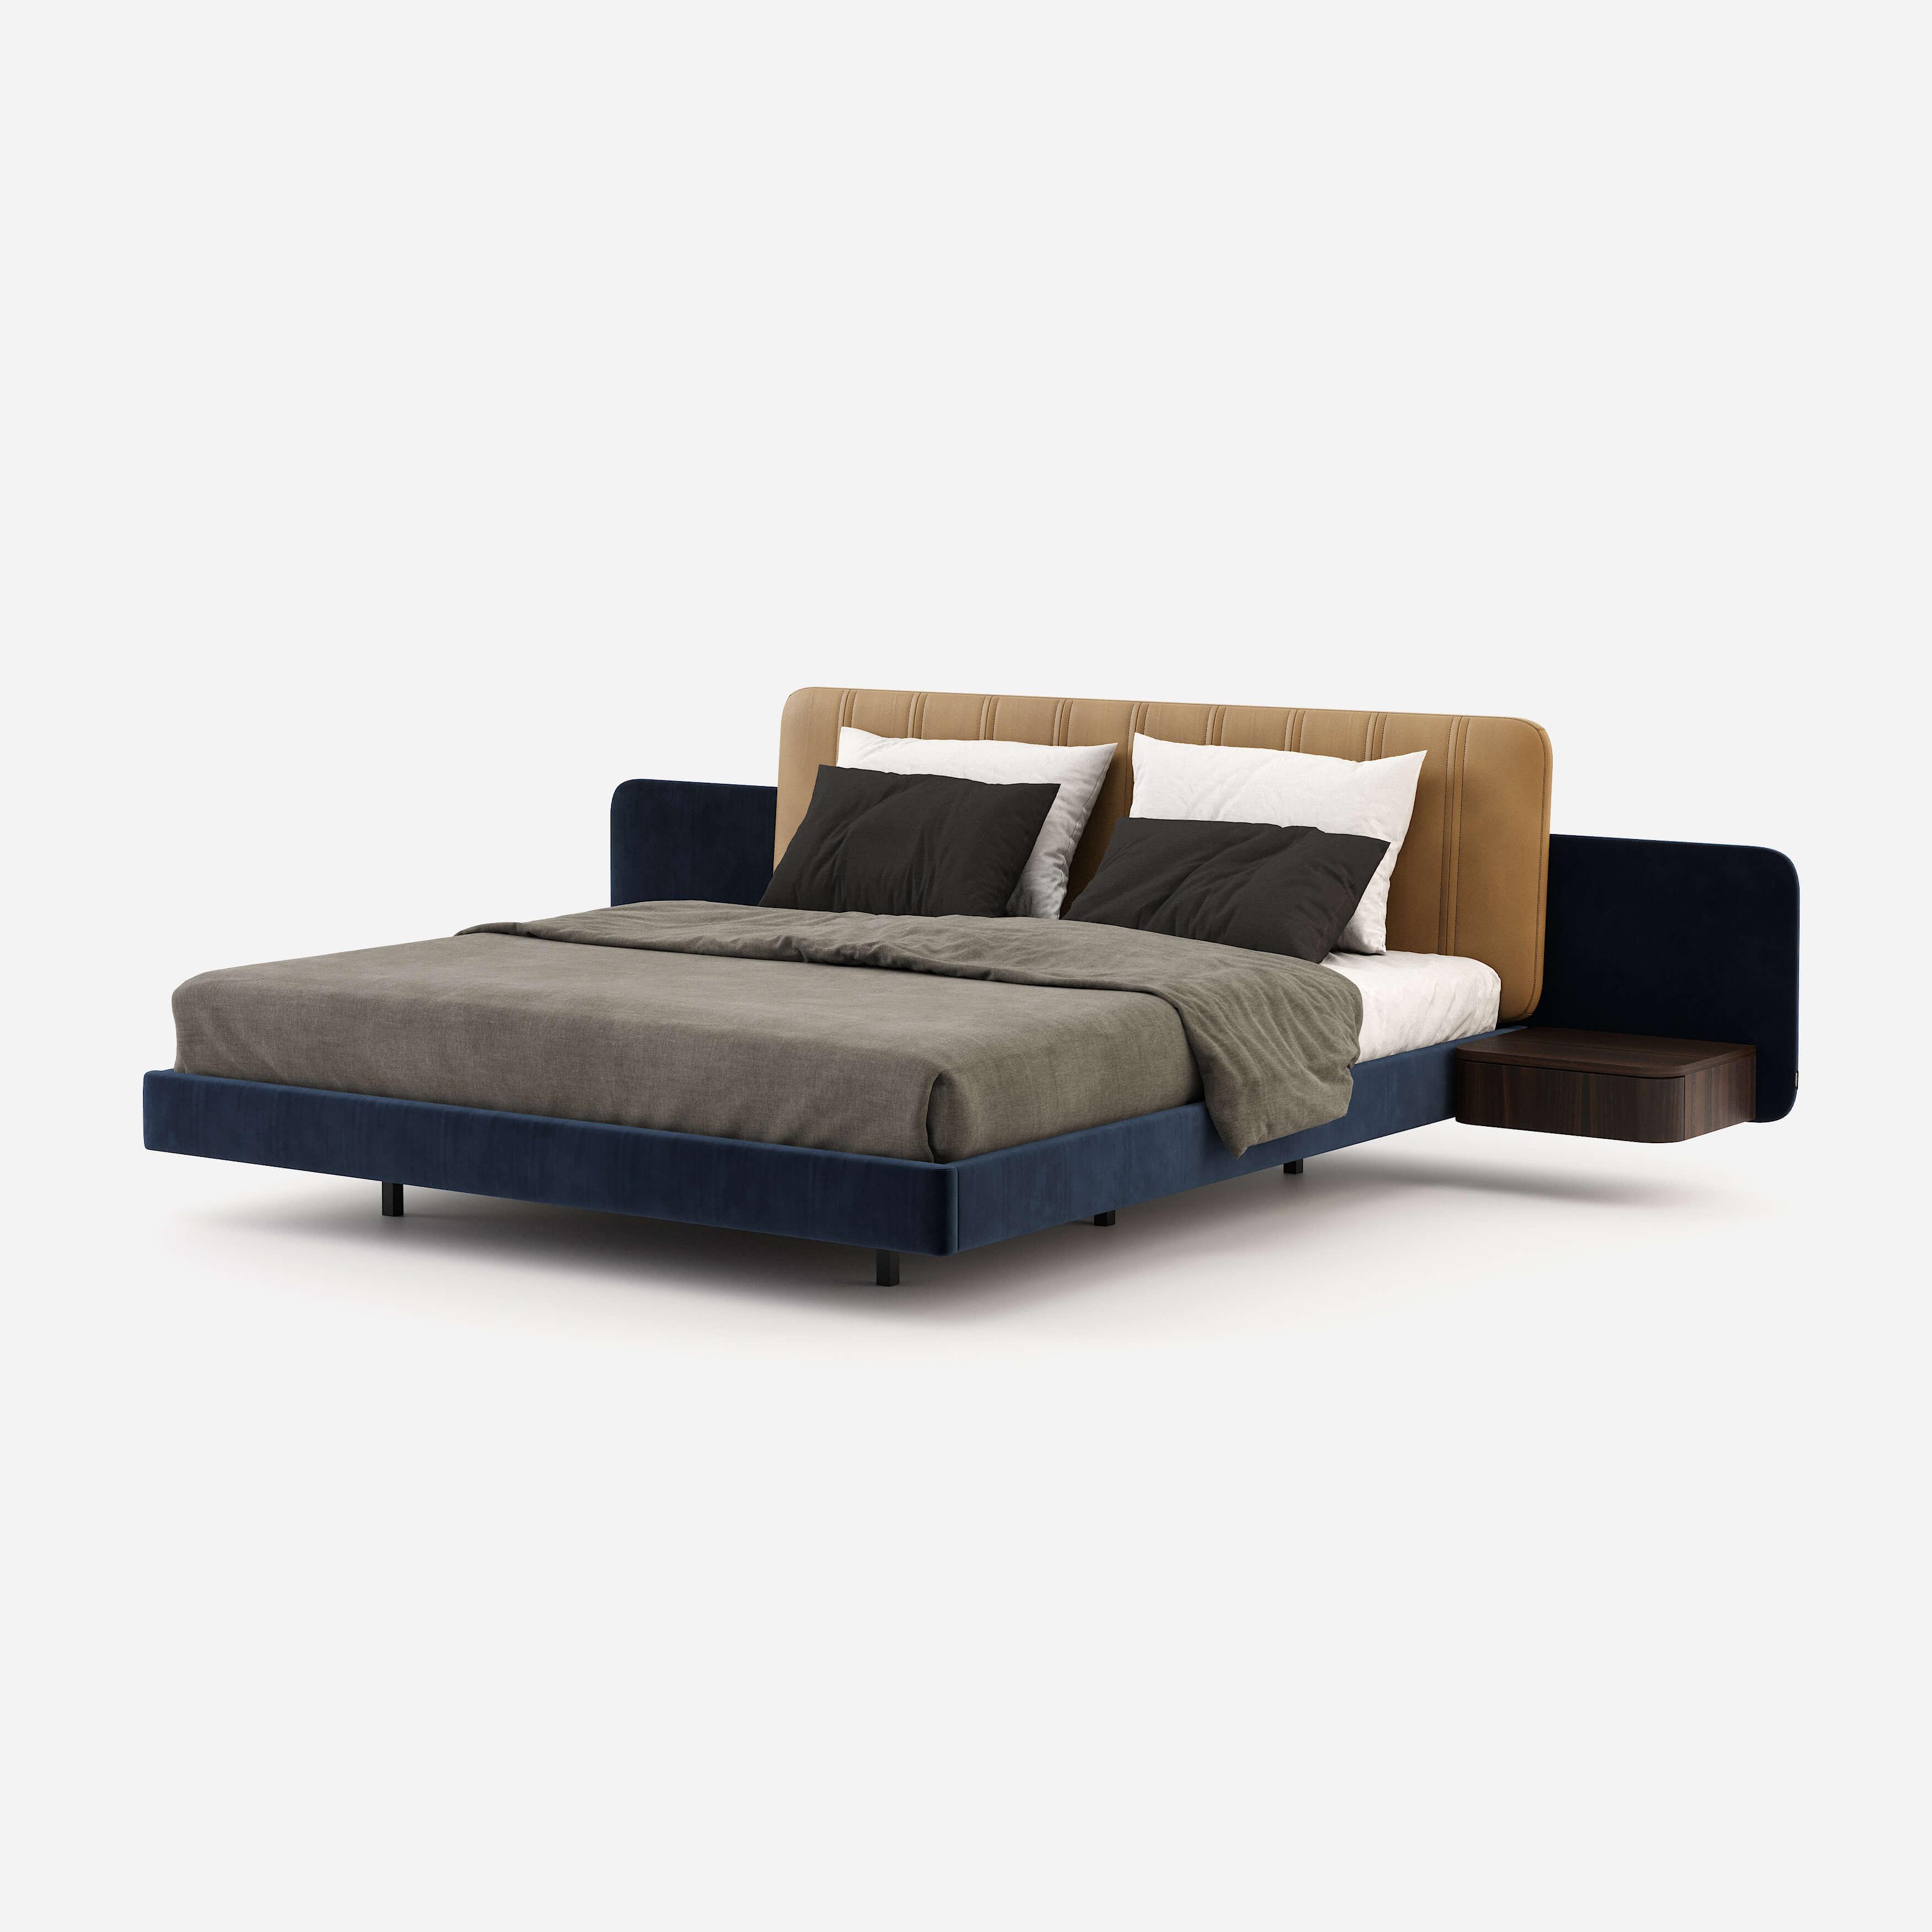 amanda-bed-elemental-collection-interior-design-home-decor-master-bedroom-projects-upholstered-design-furniture-1